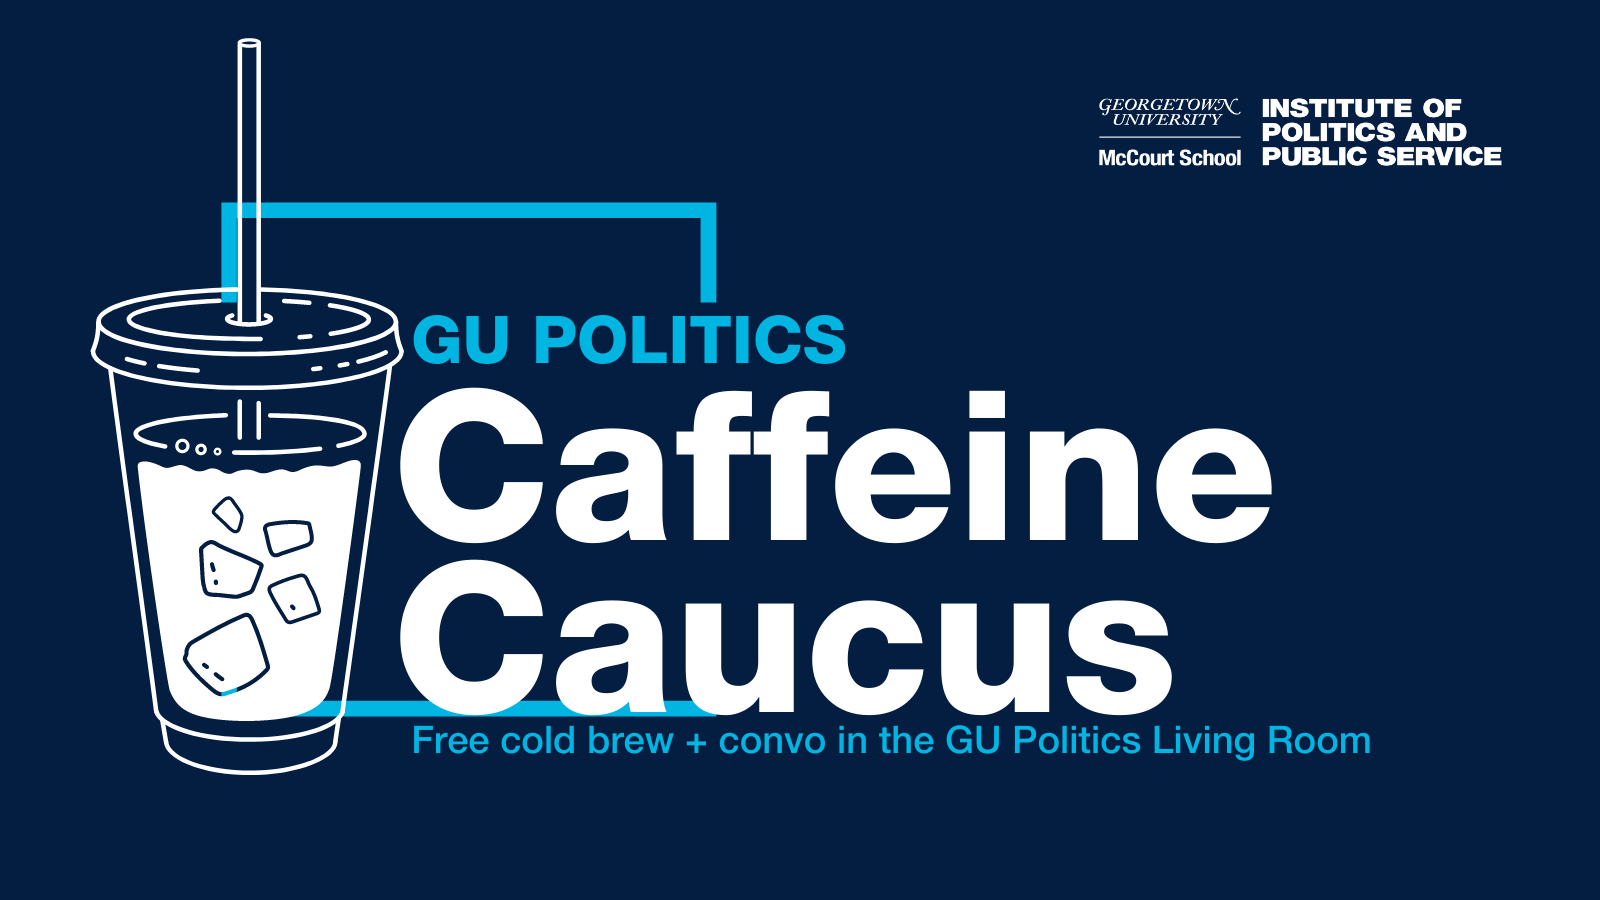 GU Politics Caffeine Caucus - Free cold brew + convo in the GU Politics Living Room